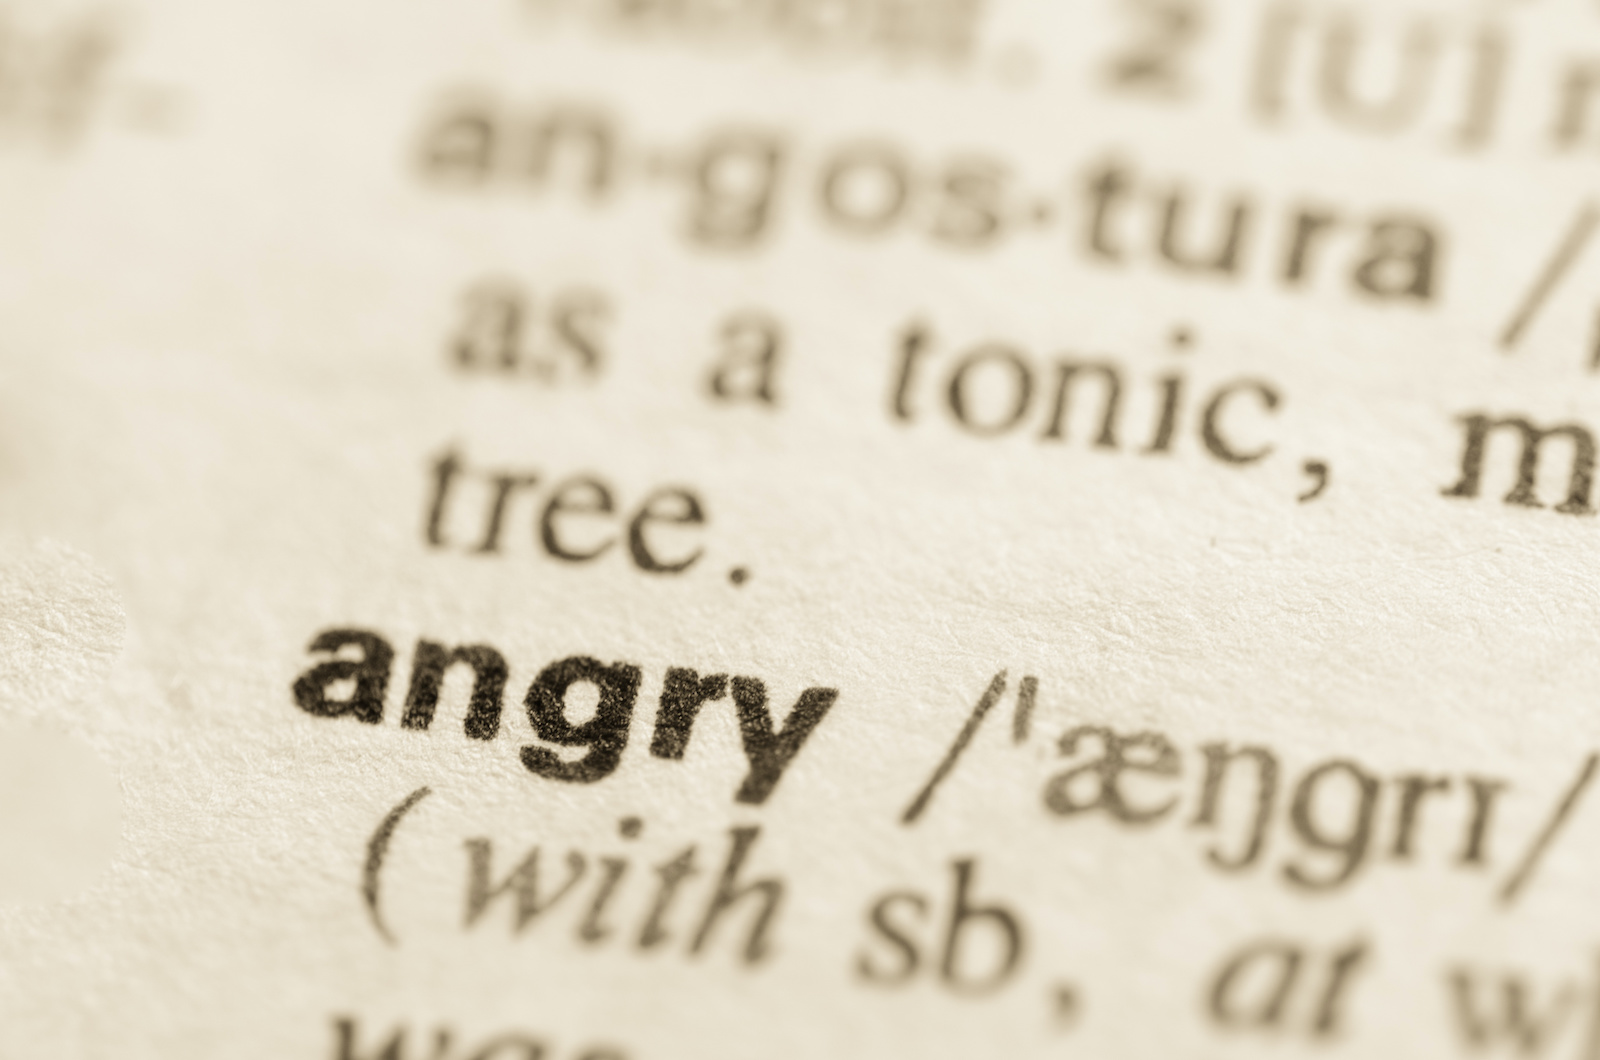 angry word - summalinguae.com